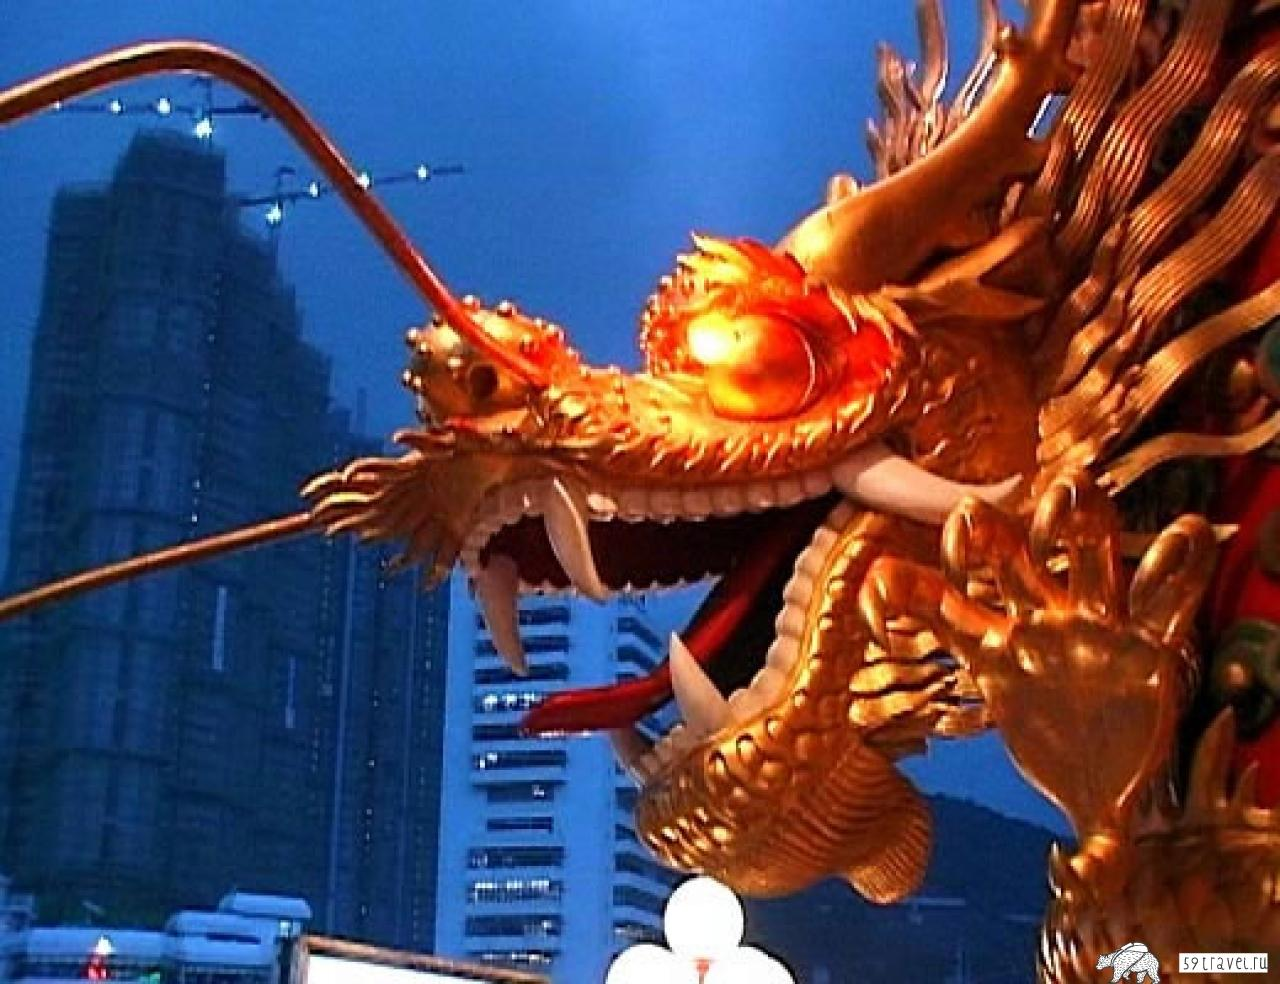 В Китае запретили «Антивирус Касперского»